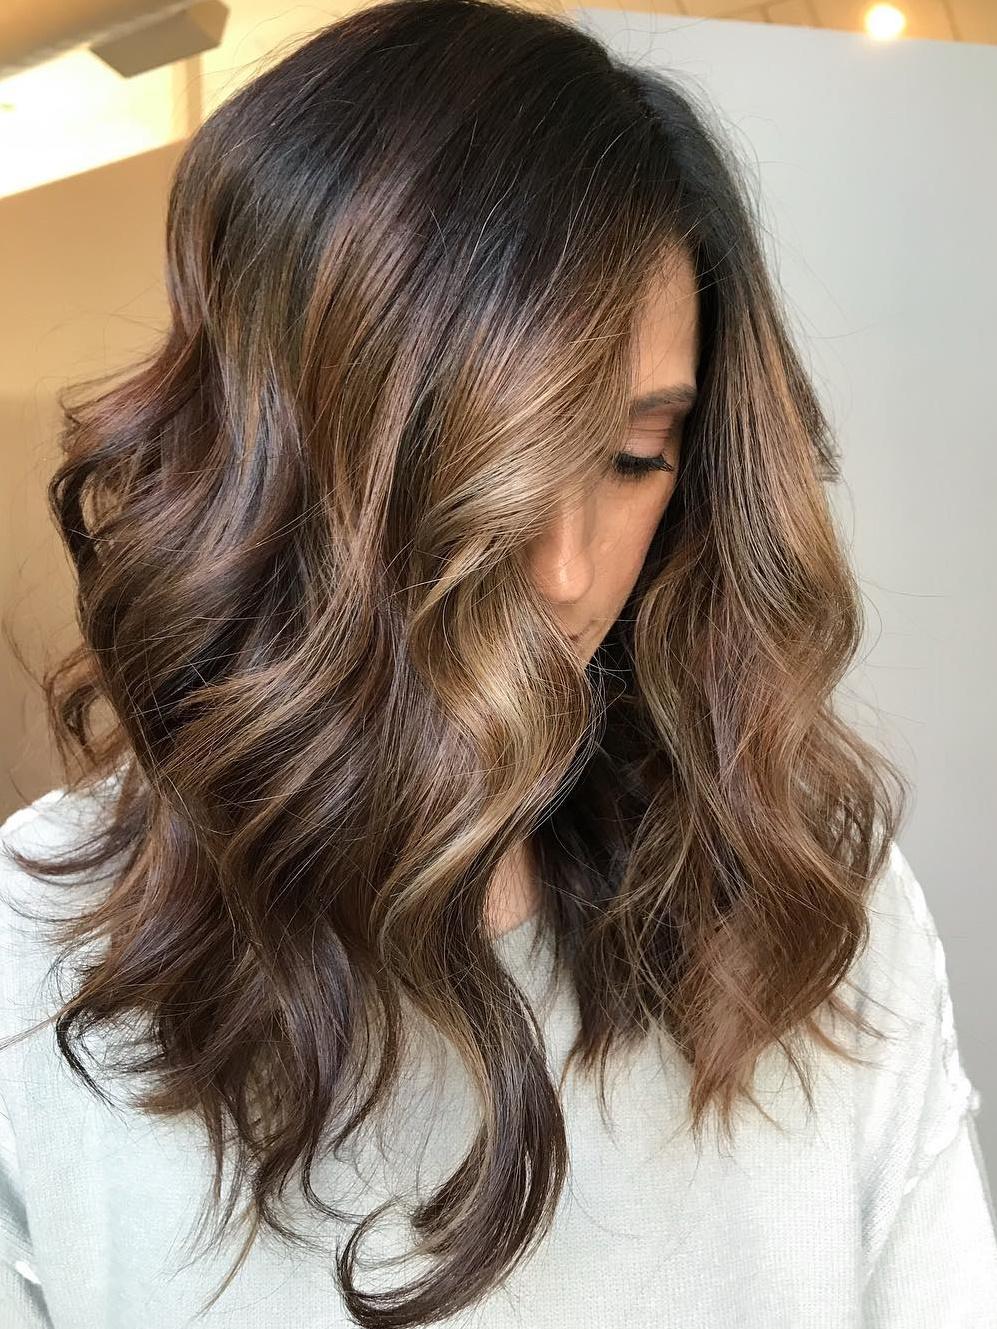 Medium Wavy Chocolate Blonde Hairstyle